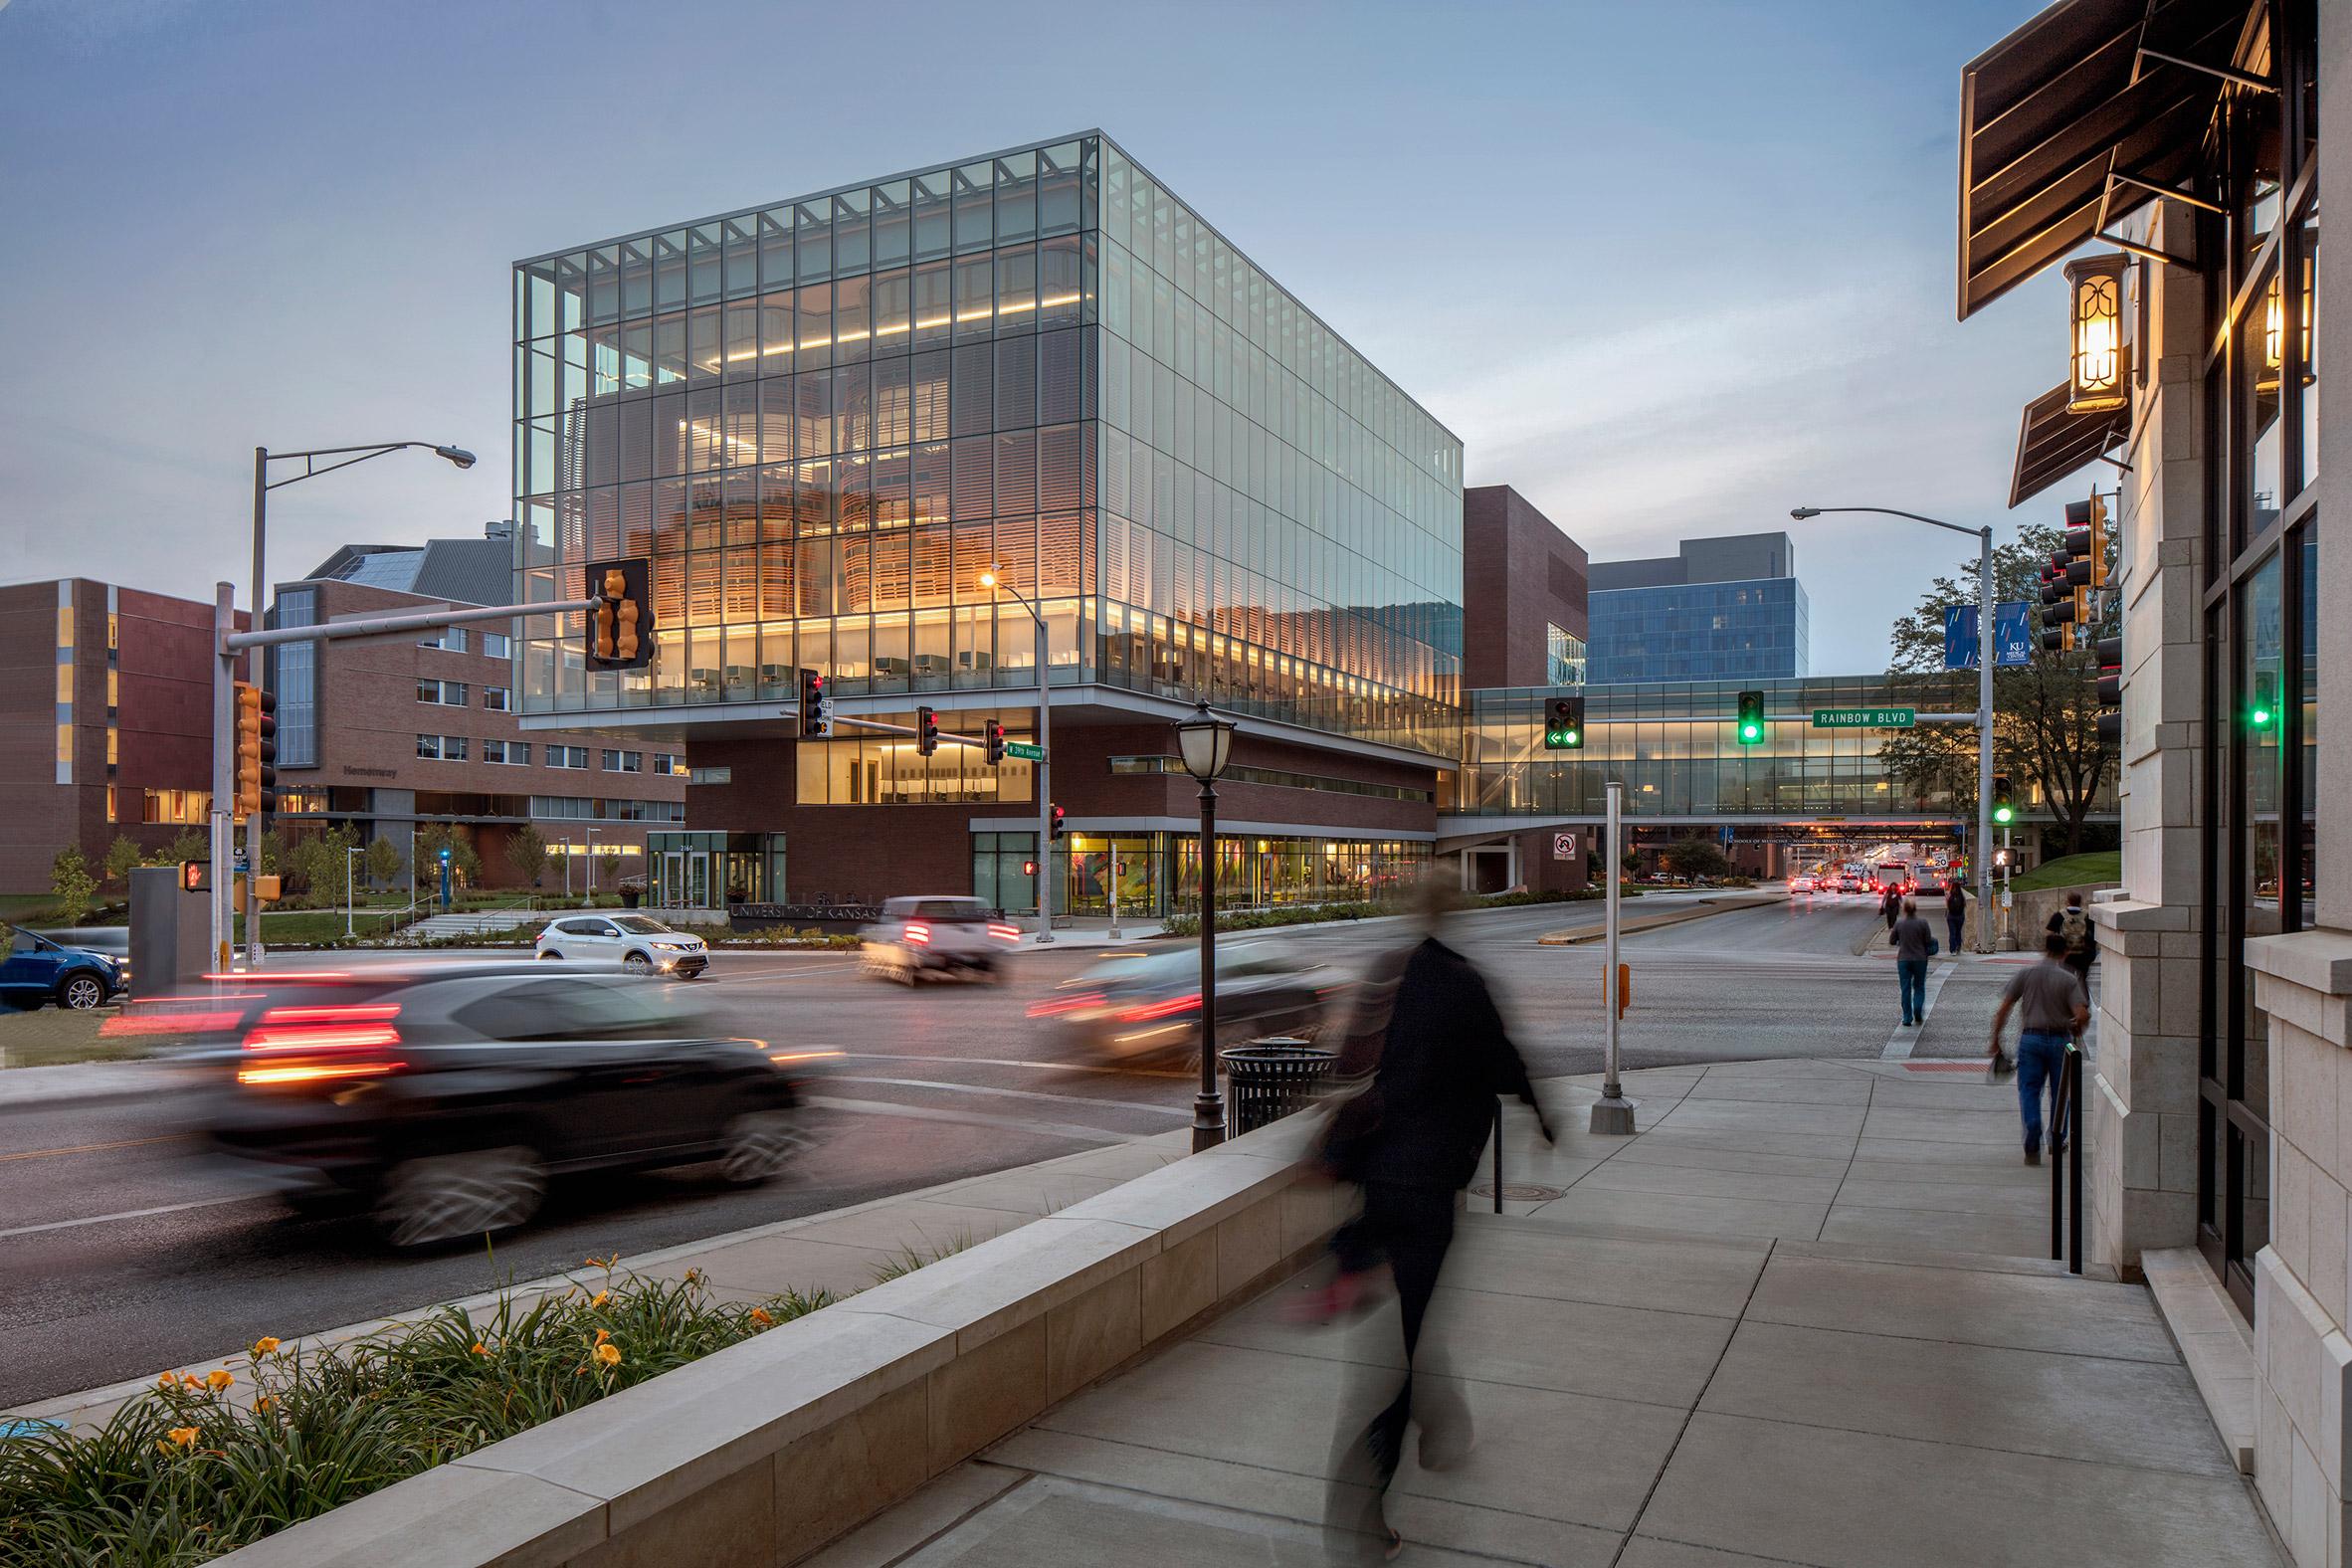 KU Medical Center by CO Architects